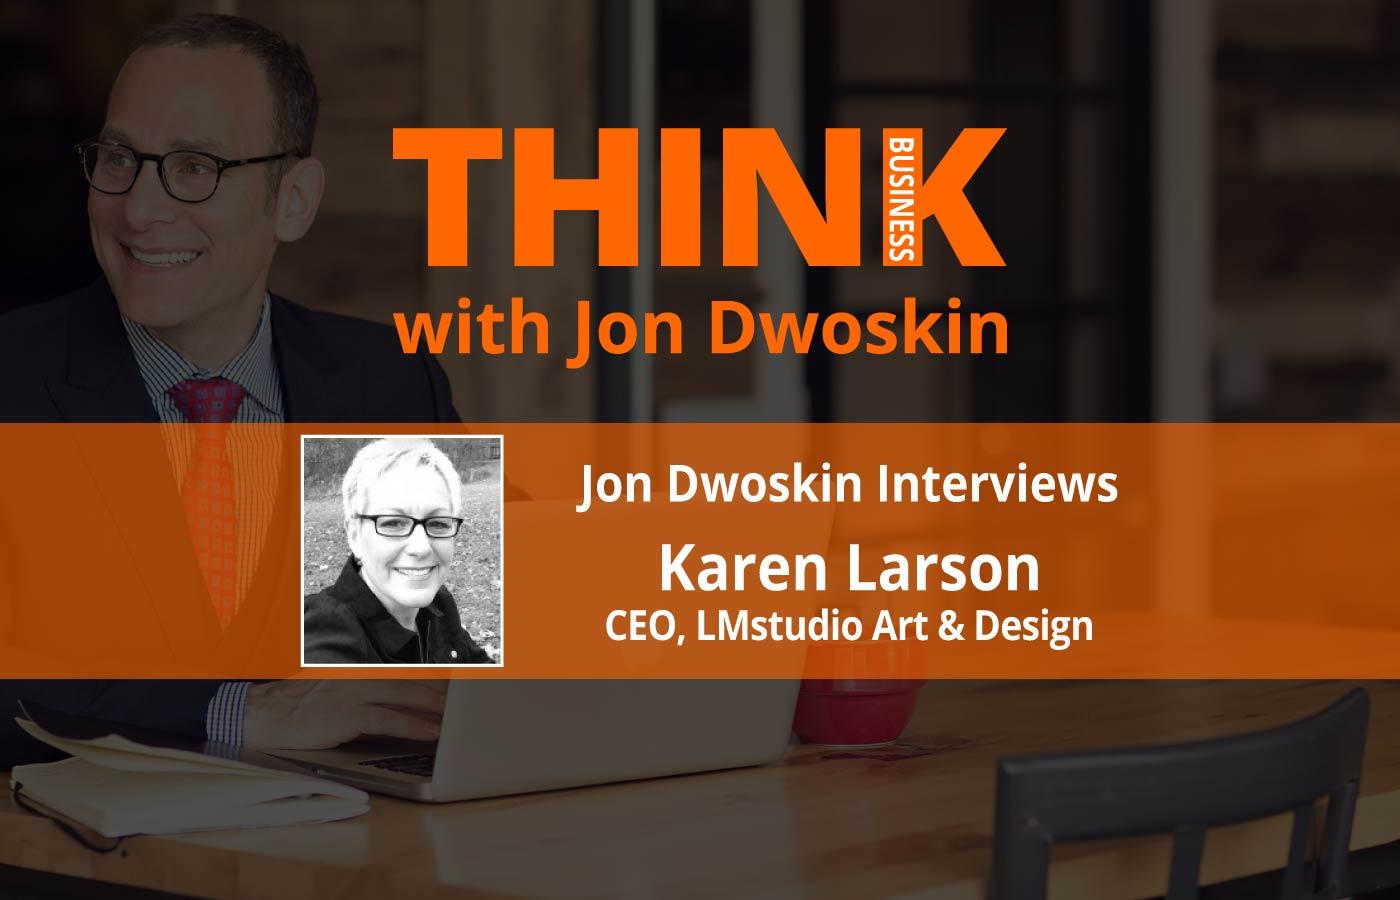 THINK Business: Jon Dwoskin Interviews Karen Larson, CEO of LMstudio Art & Design